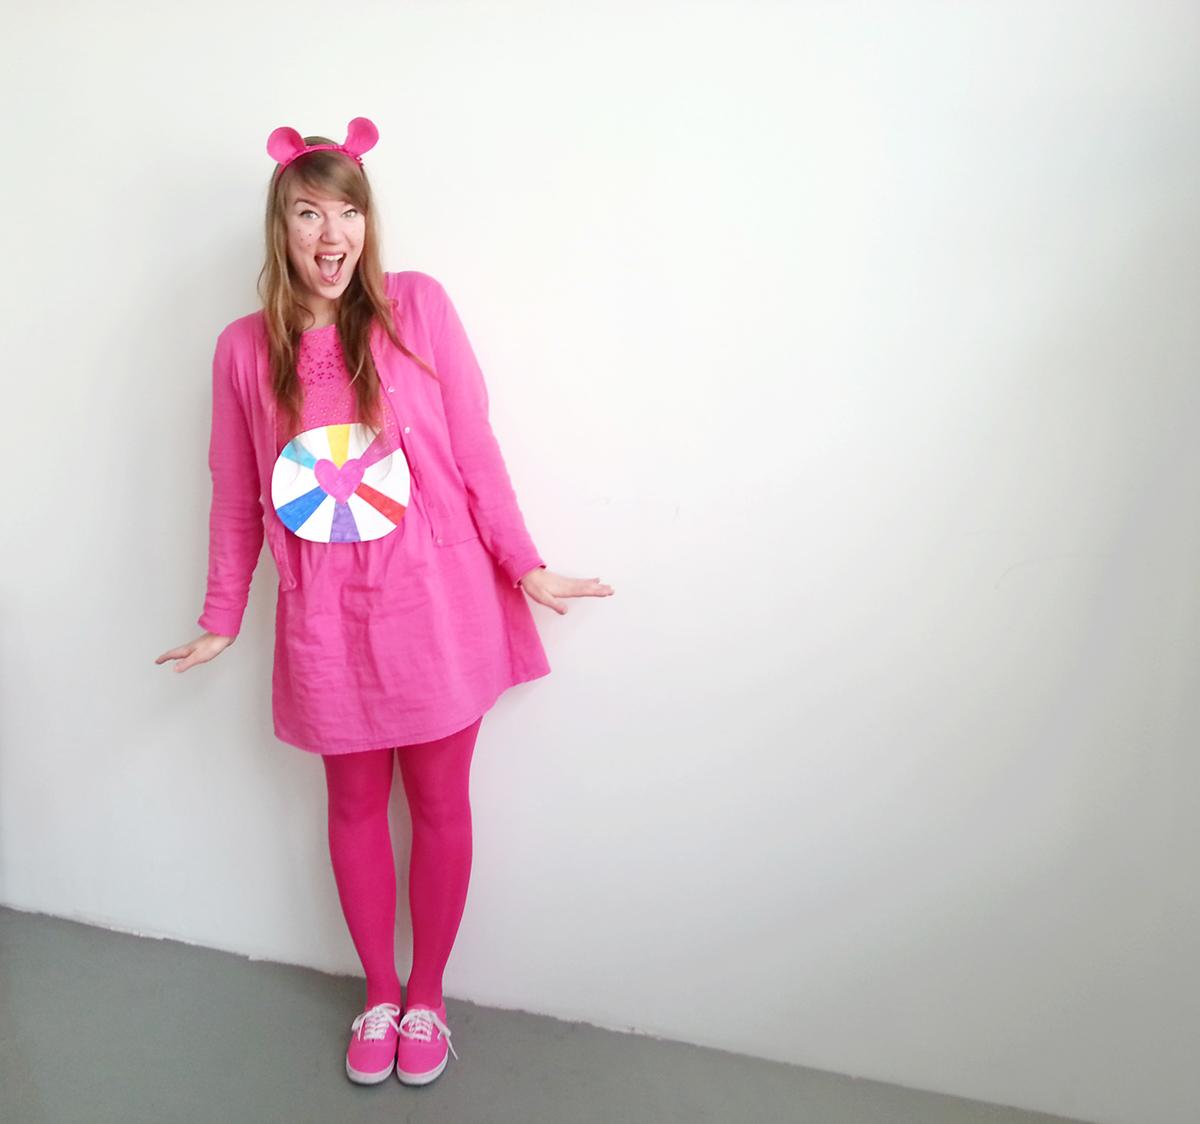 Luloveshandmade-Easy DIY Costumes-Kostüm selbermachen-9-Care Bear-Glücksbärchen